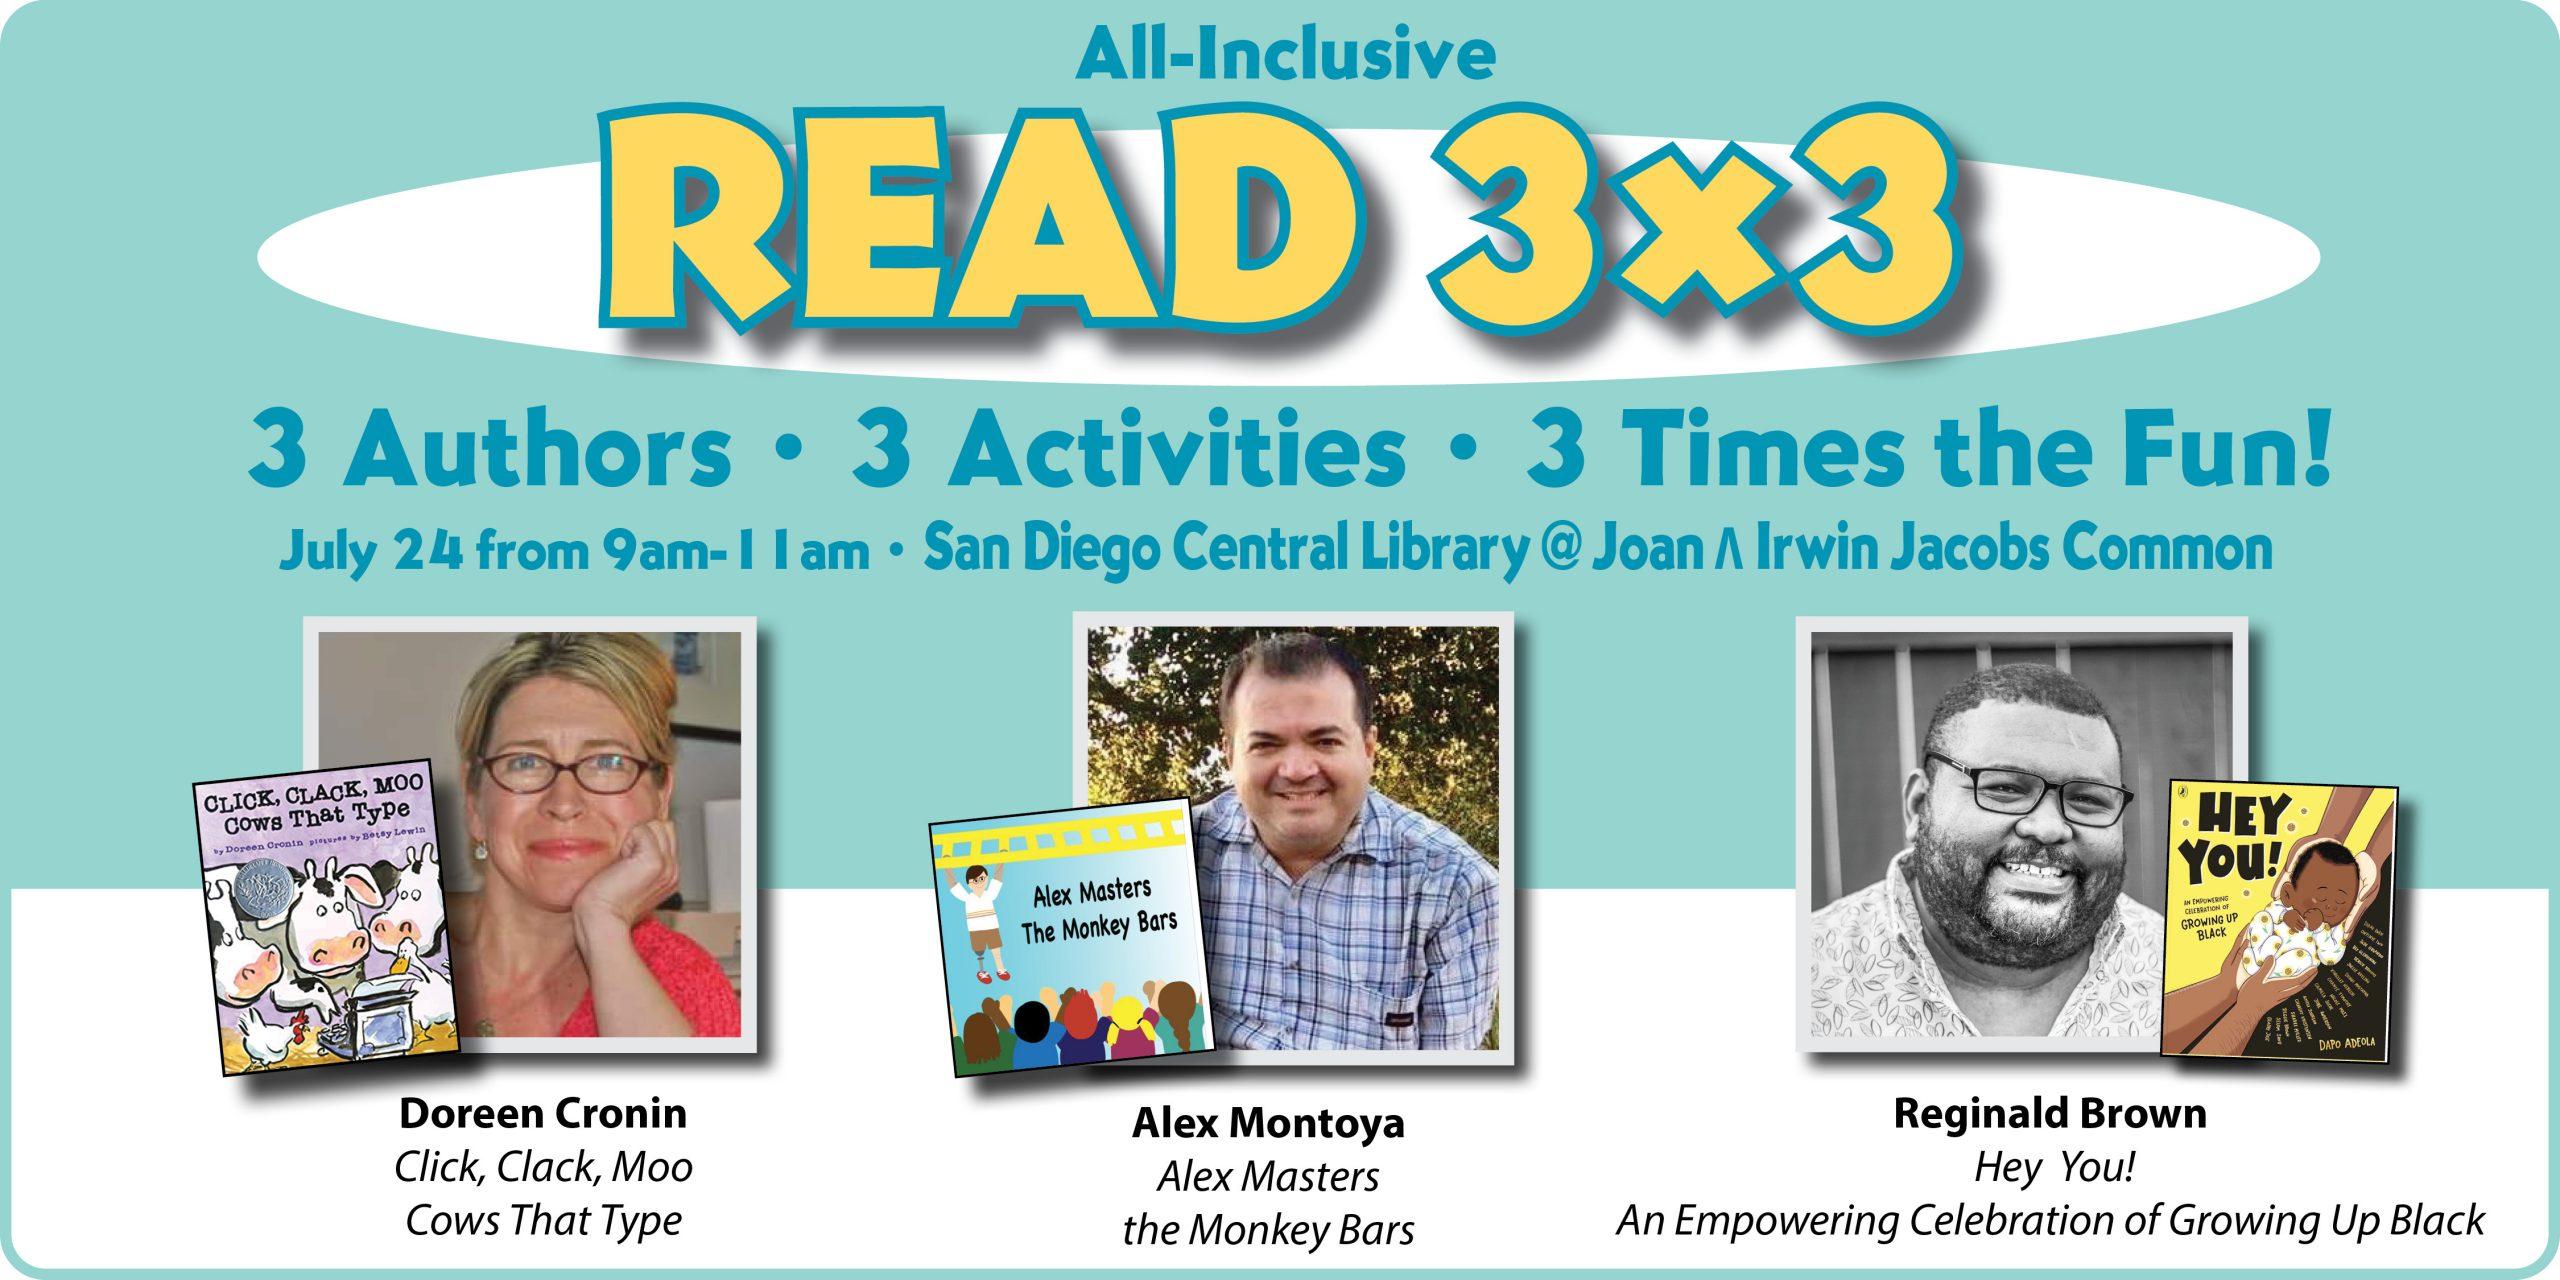 All-Inclusive READ 3X3 Literacy Event